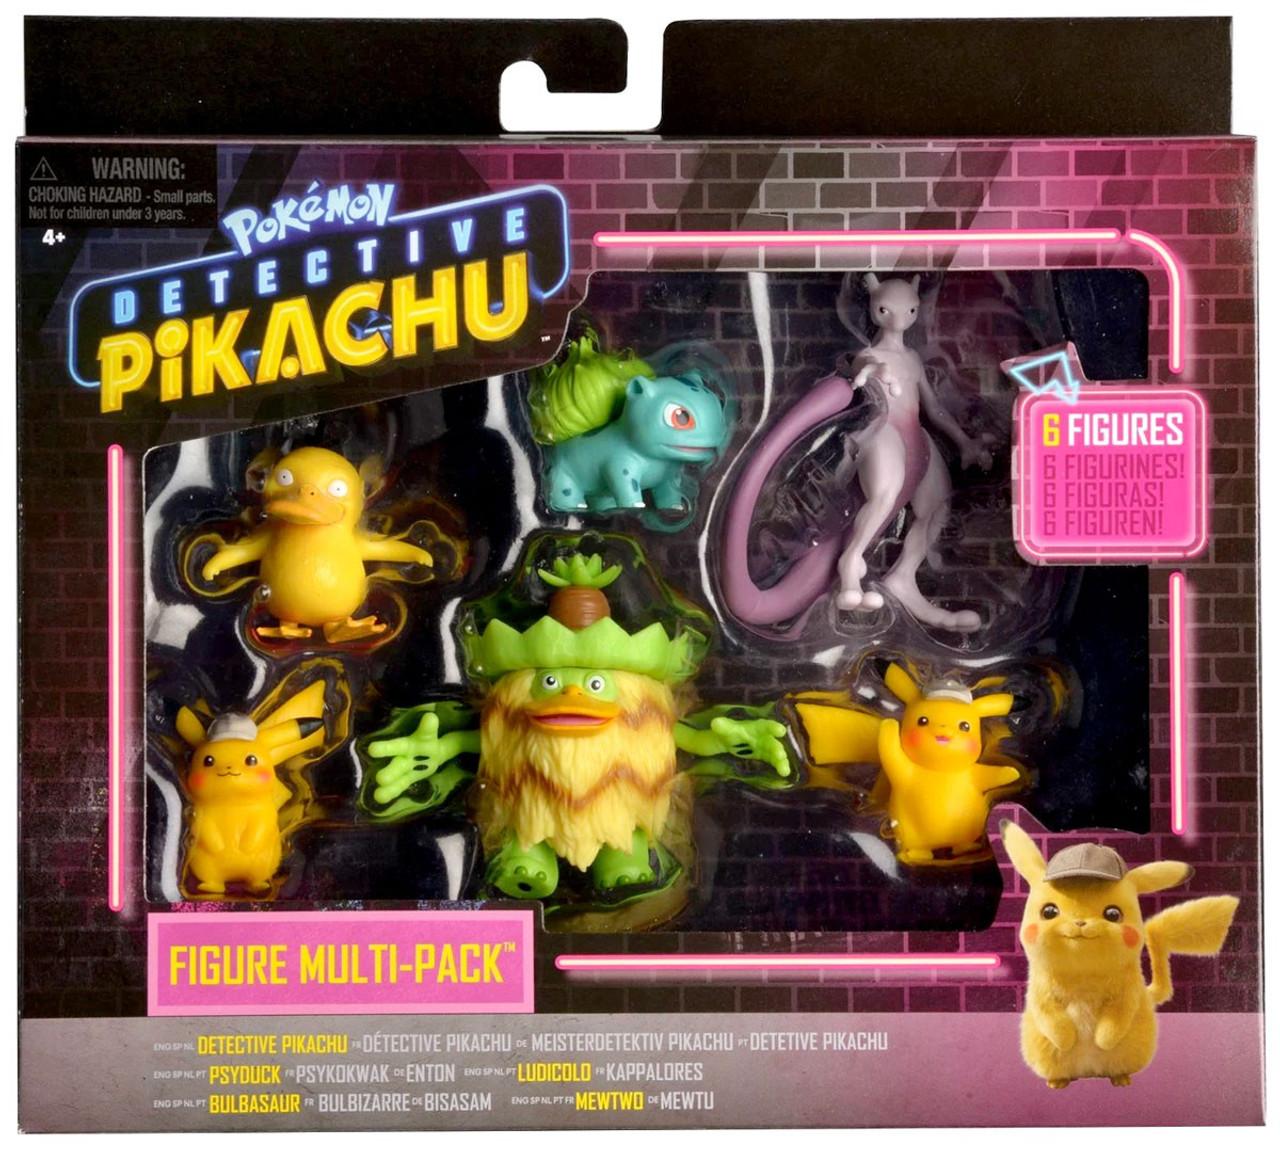 Pokemon Detective Pikachu Detective Pikachu Psyduck Ludicolo